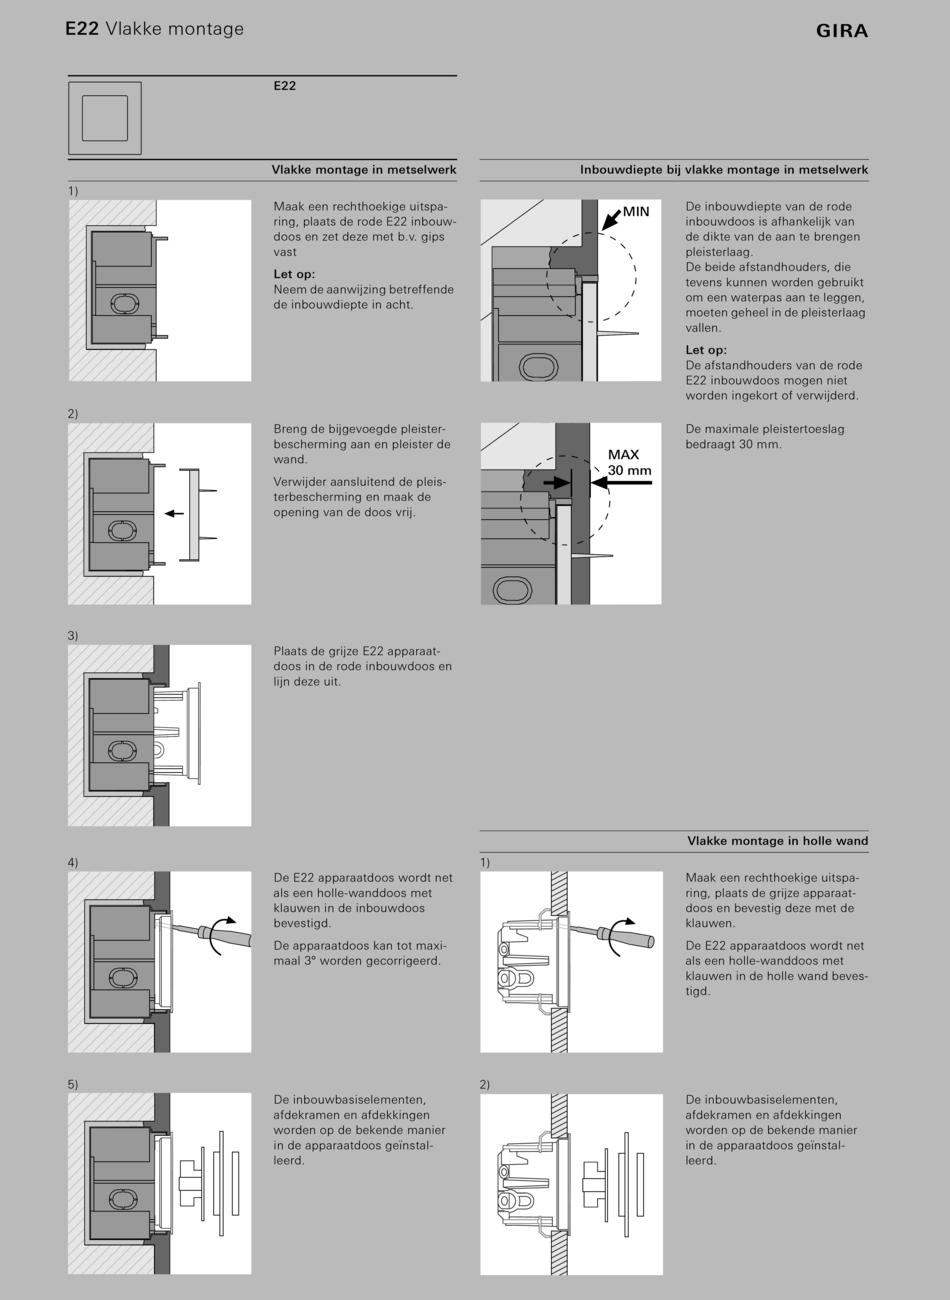 gira giersiepen gmbh co kg gira dcs ip gateway make an. Black Bedroom Furniture Sets. Home Design Ideas